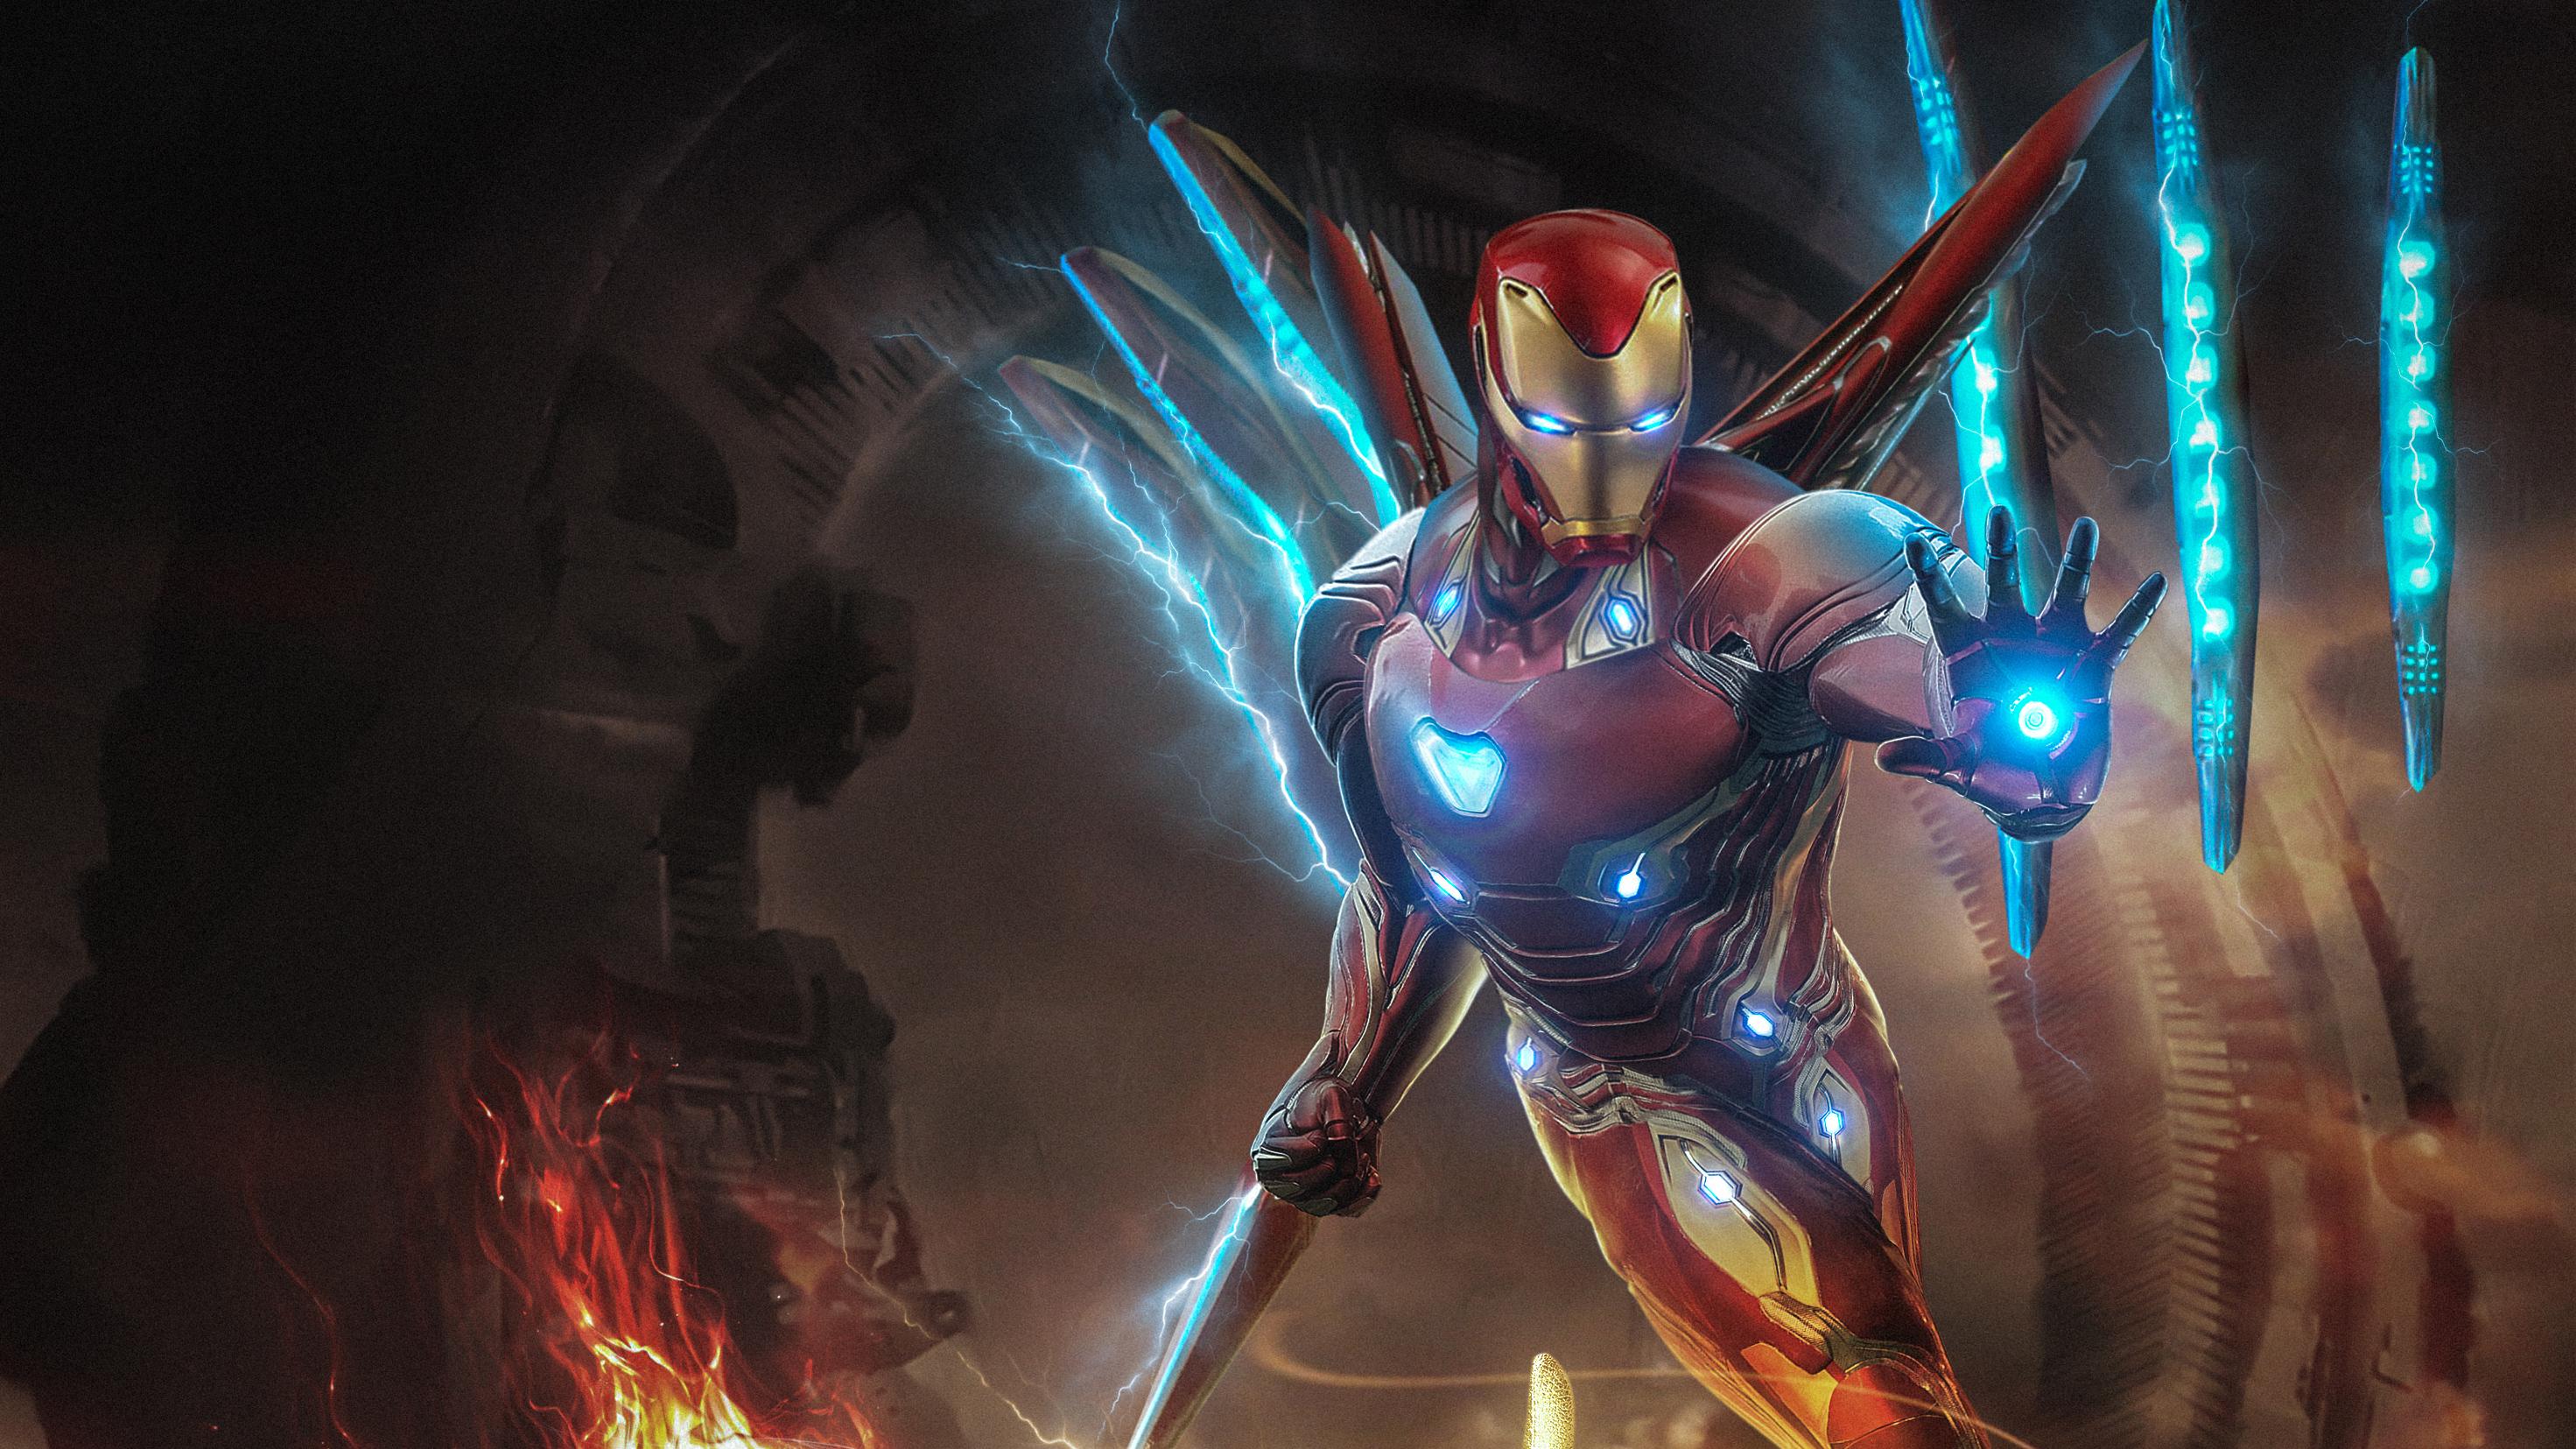 Movie Avengers Endgame The Avengers Iron Man Hd Wallpaper Iron